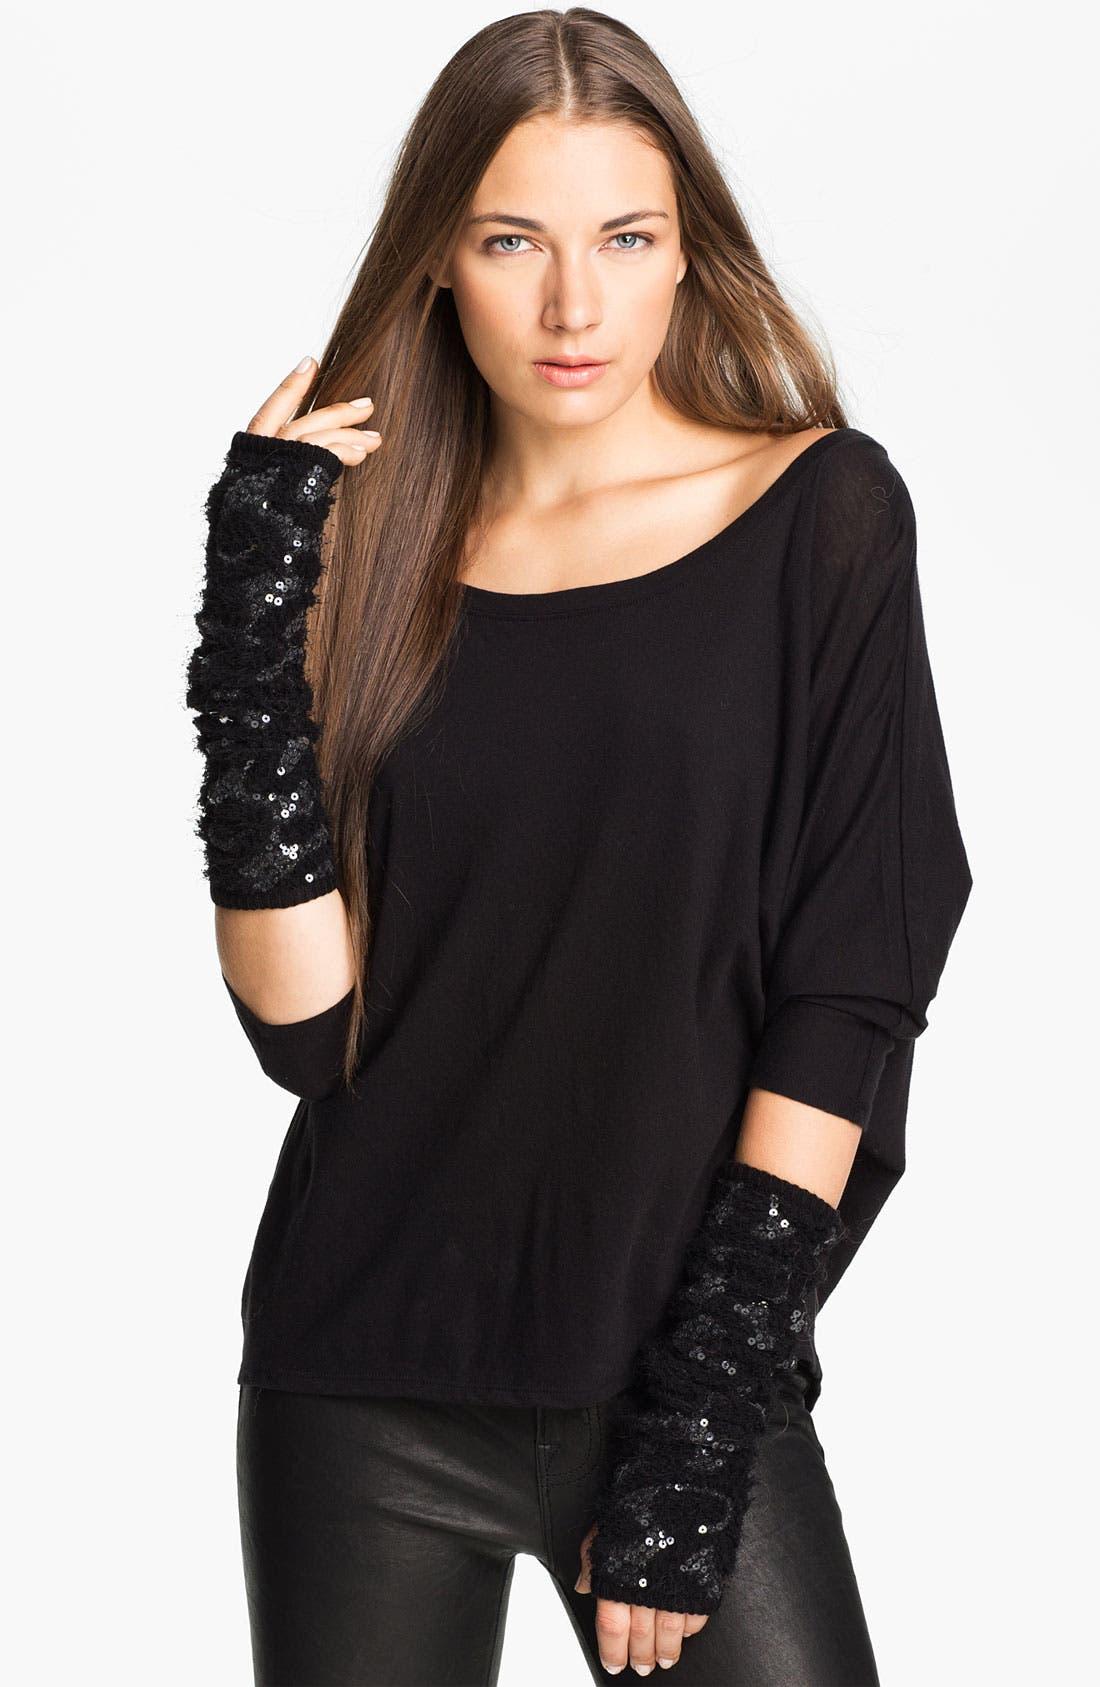 Main Image - Rachel Zoe Stretch Sequin Arm Warmers